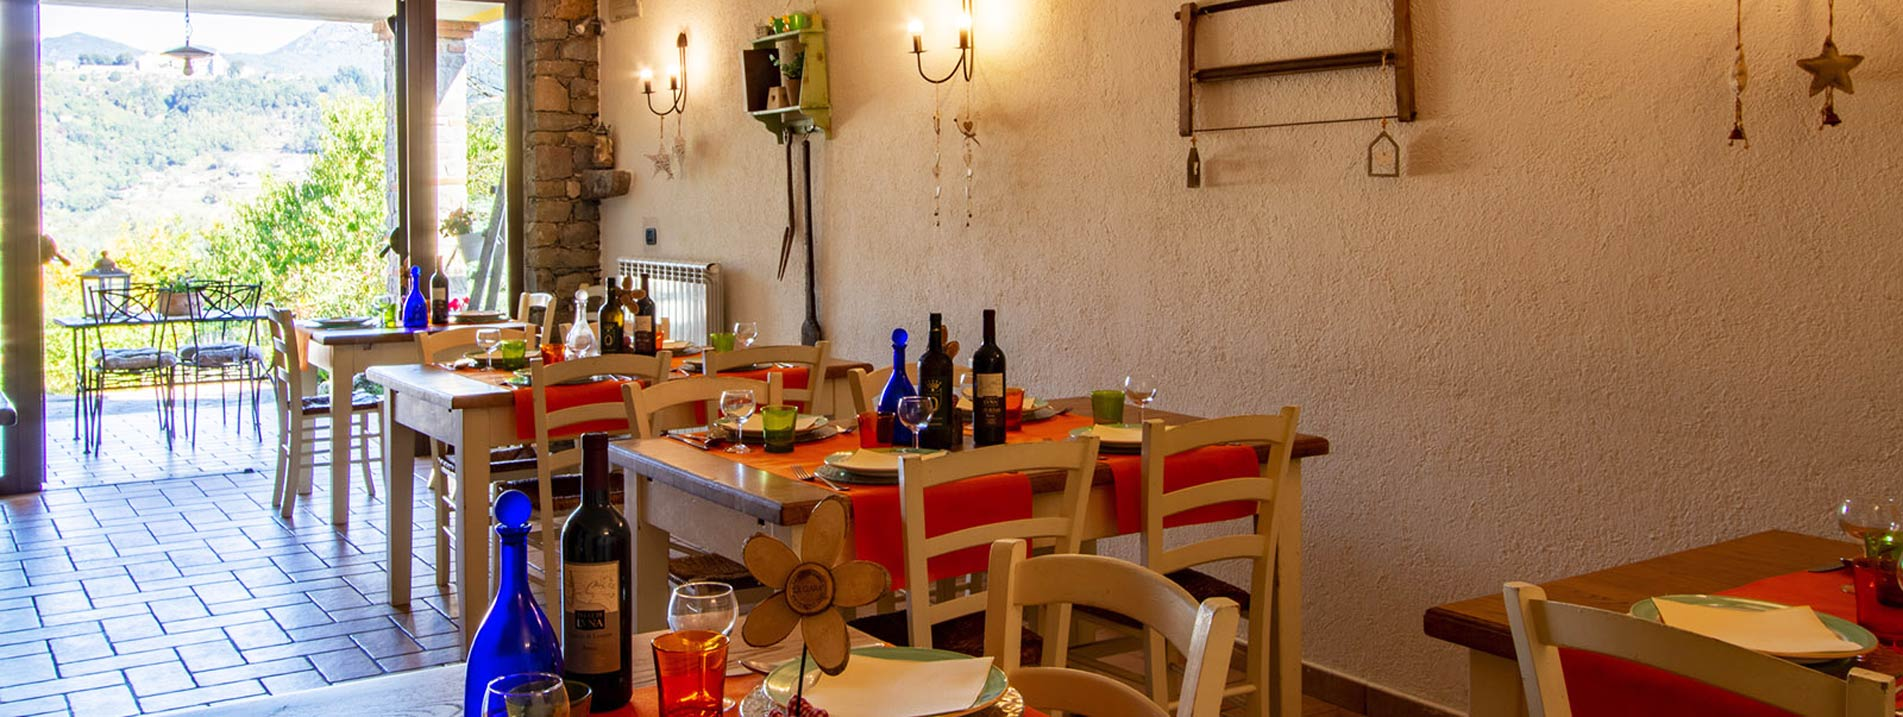 ristorant1-01